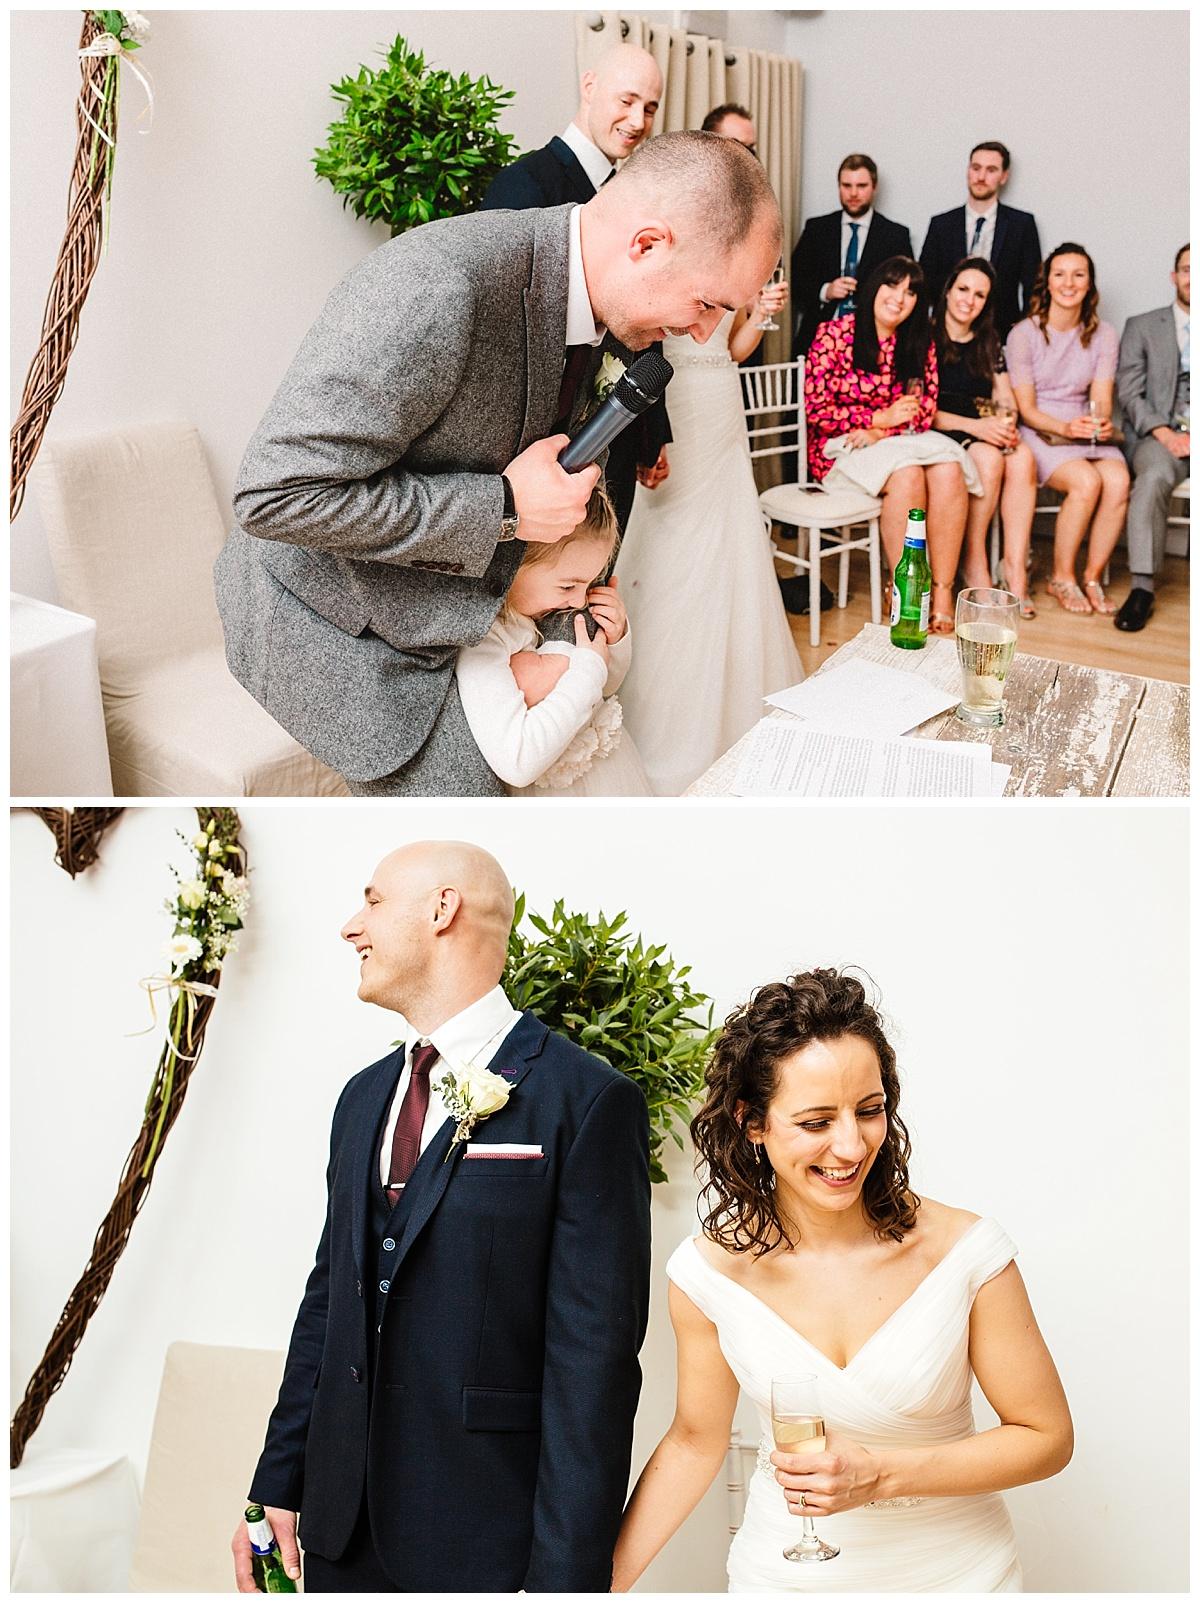 documentary photography of wedding speeches at a barn wedding